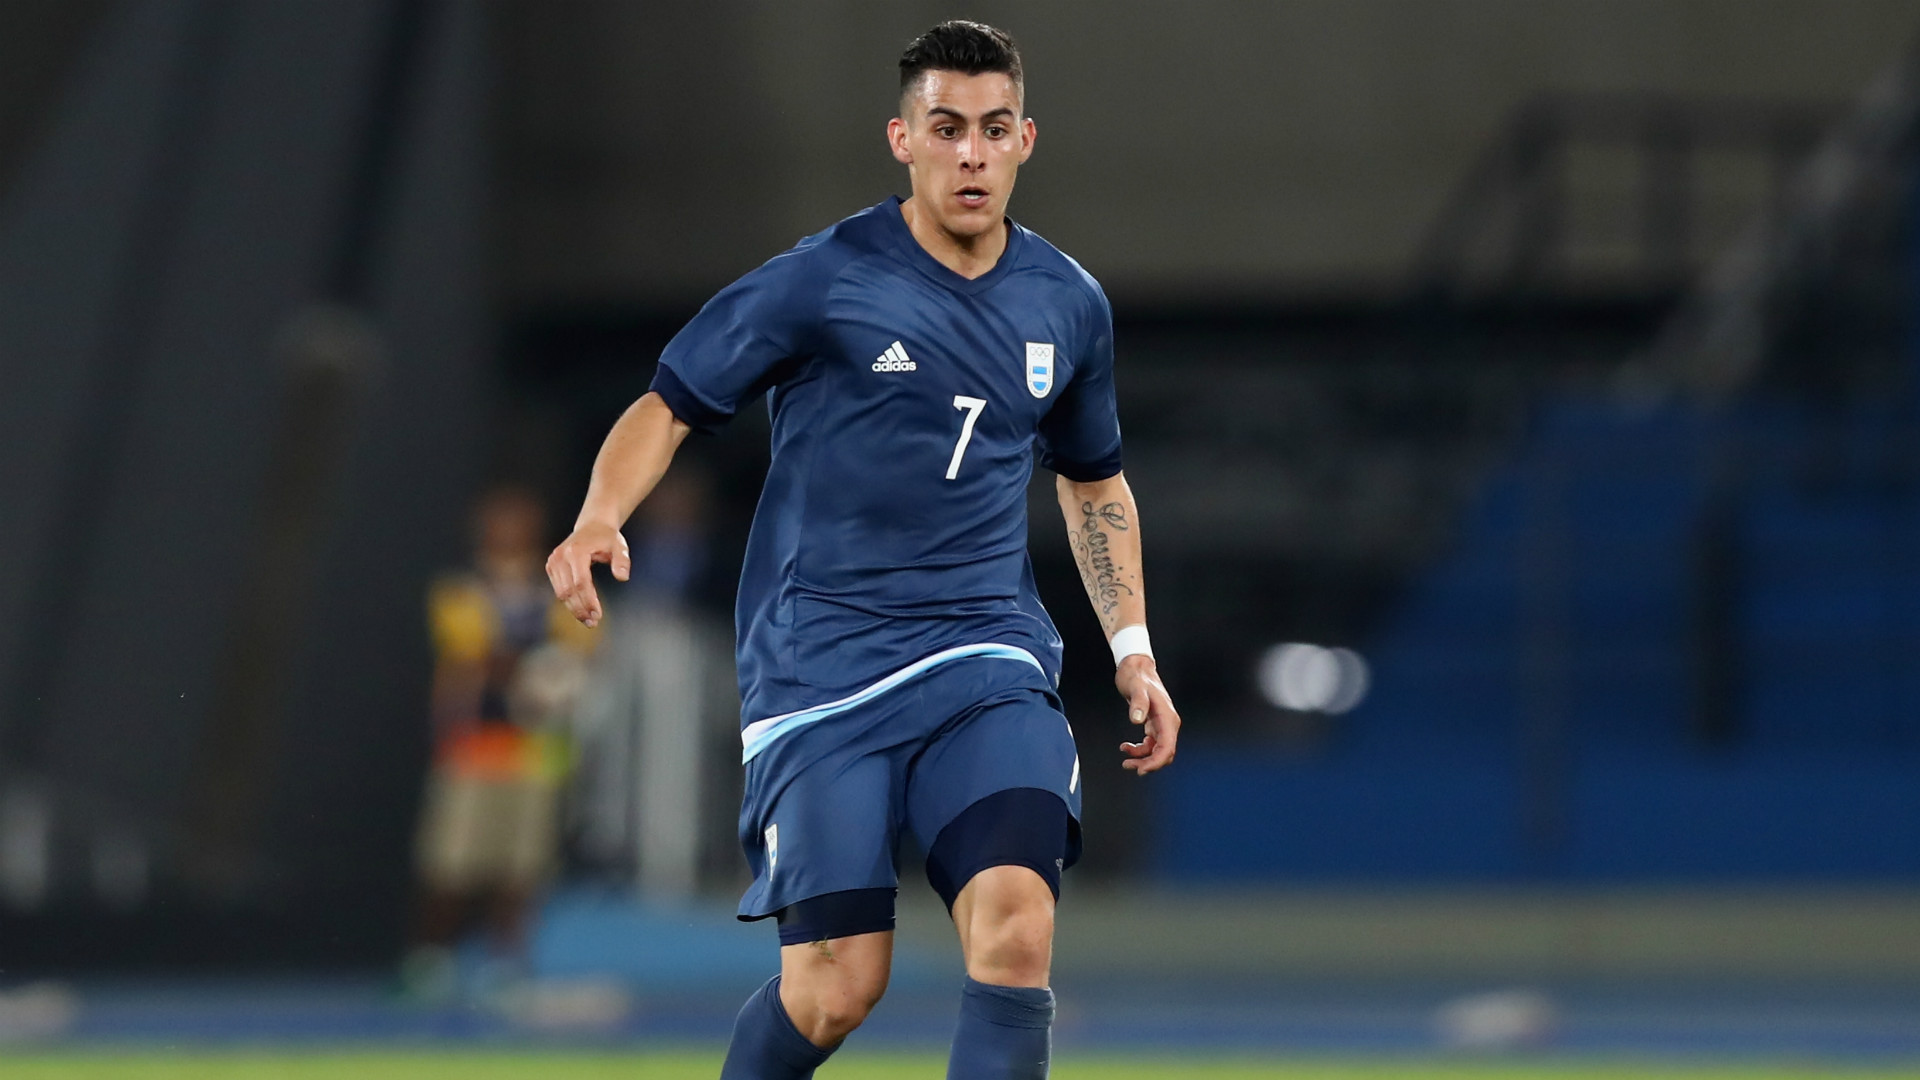 Boca Juniors star Cristian Pavon wanted as replacement for Alexis Sanchez